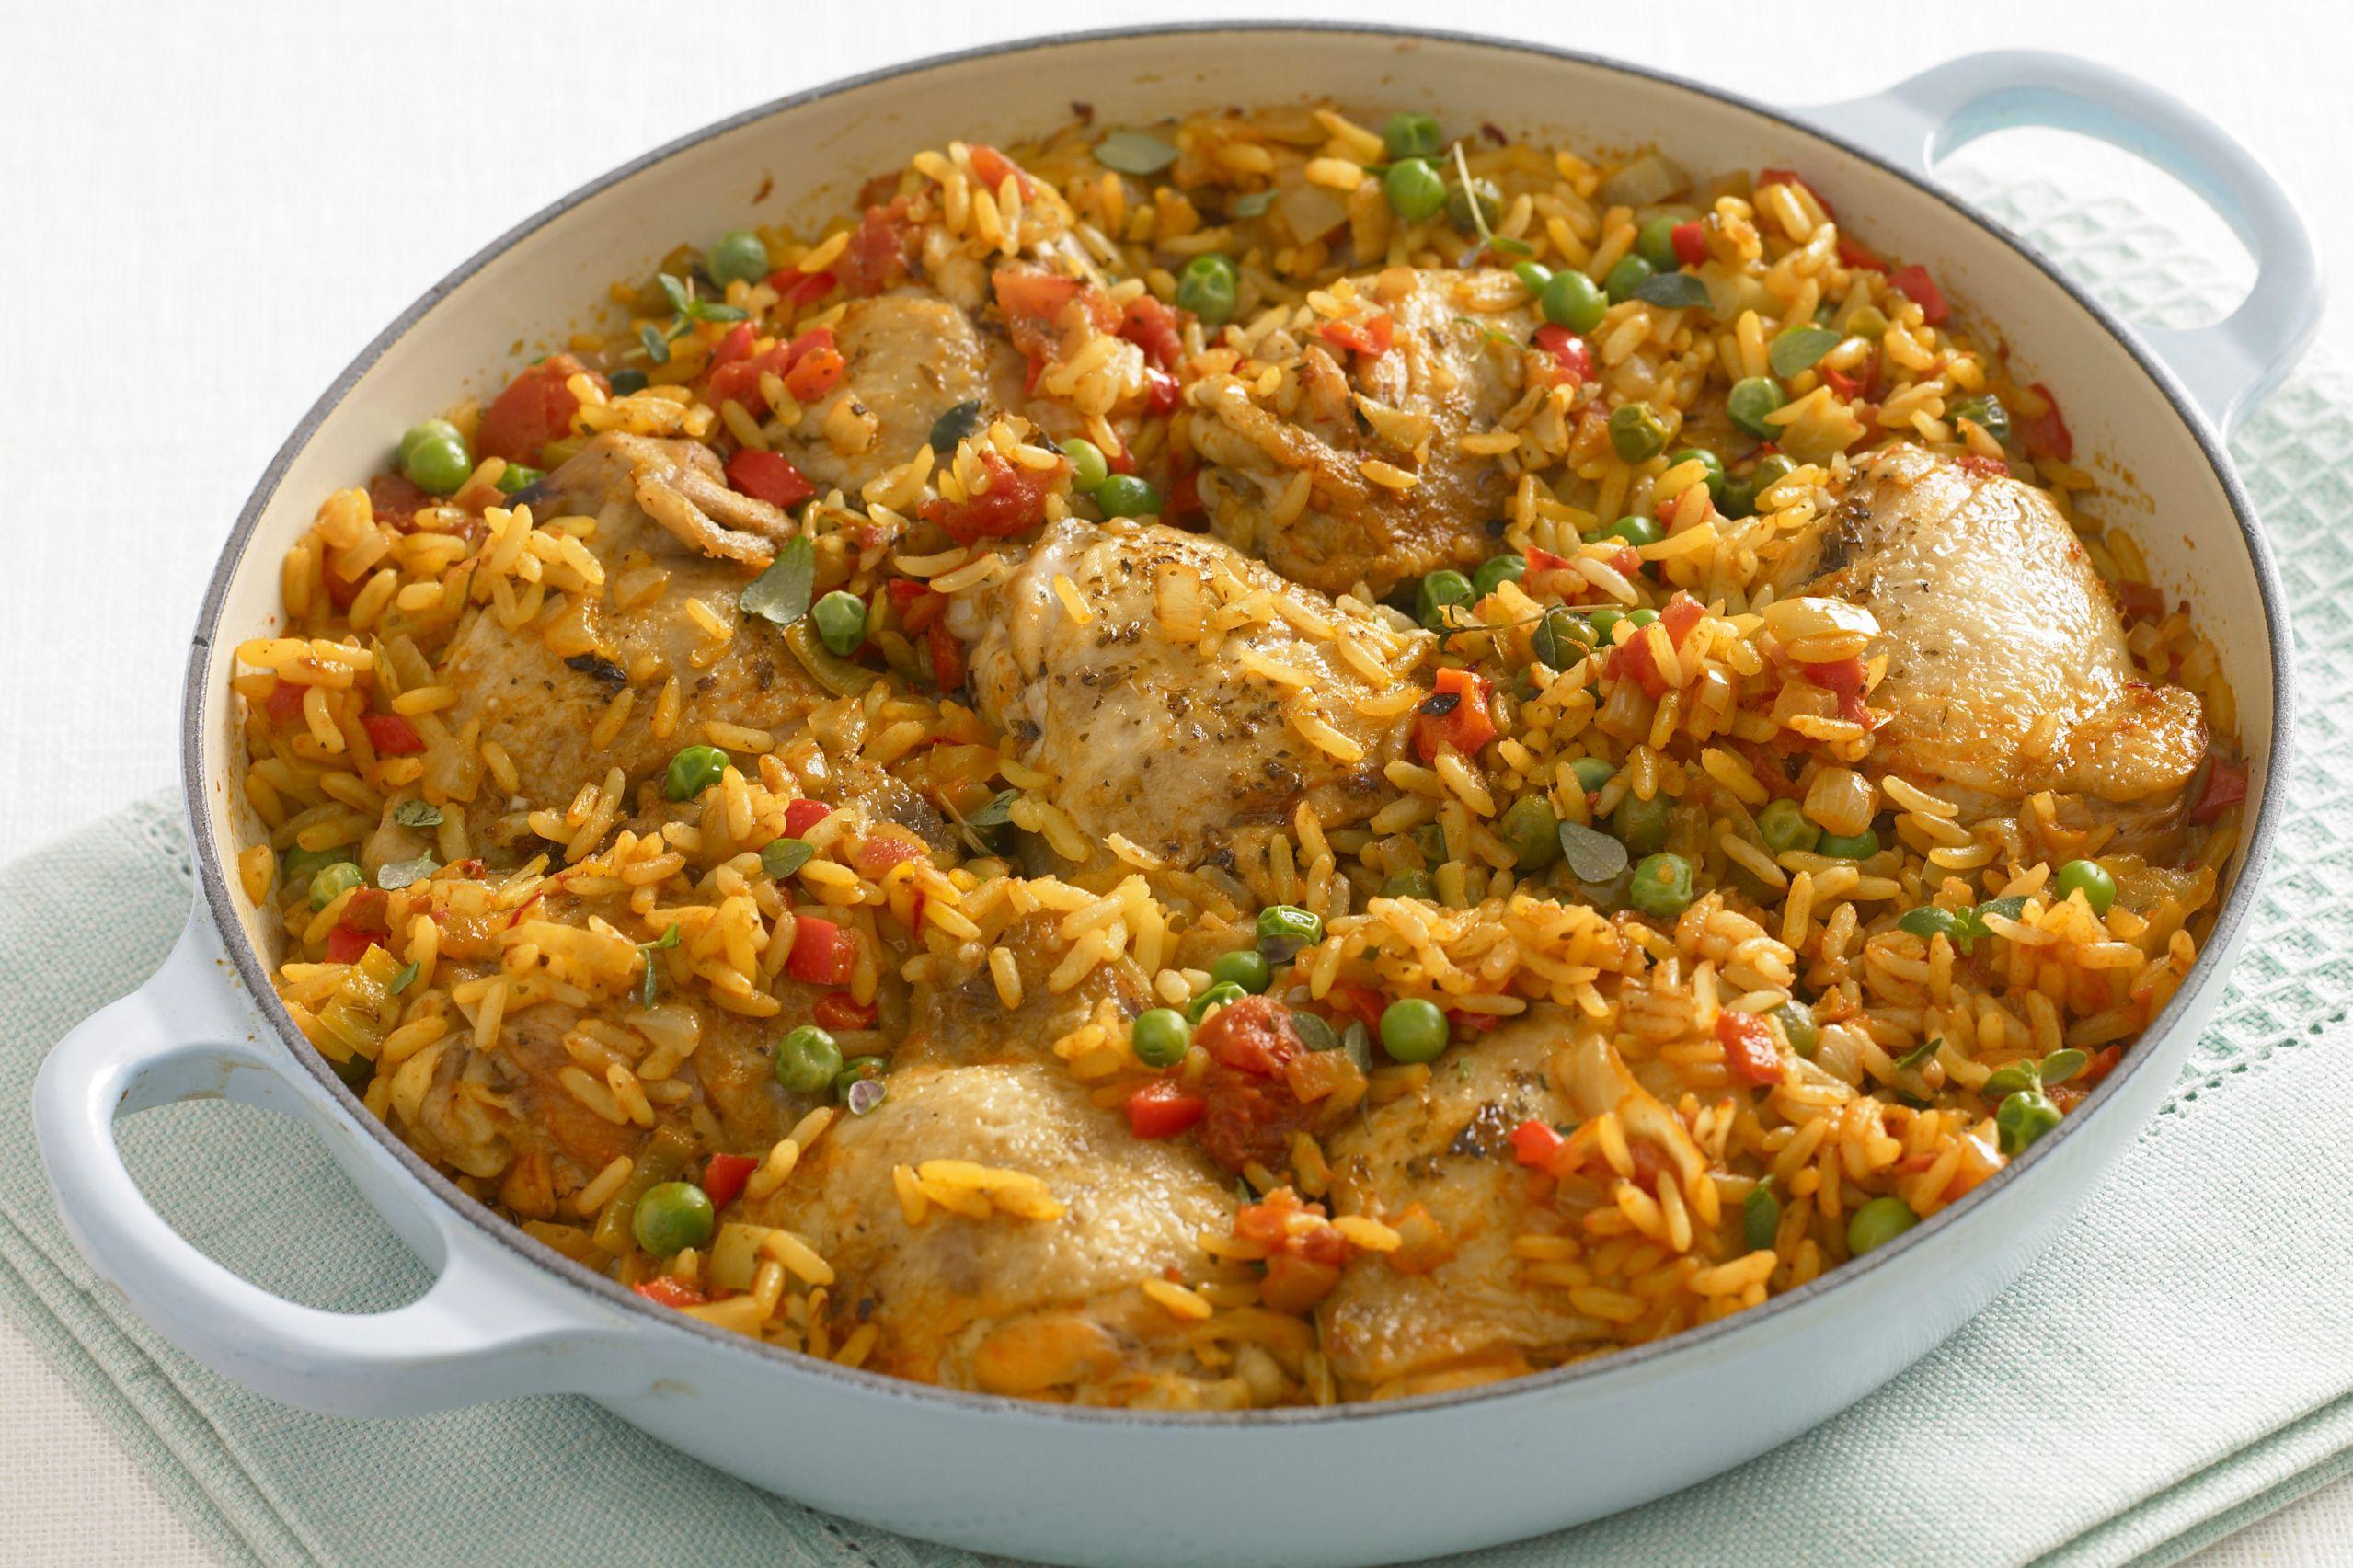 Florida style arroz con pollo recipe - Arroz salteado con pollo ...